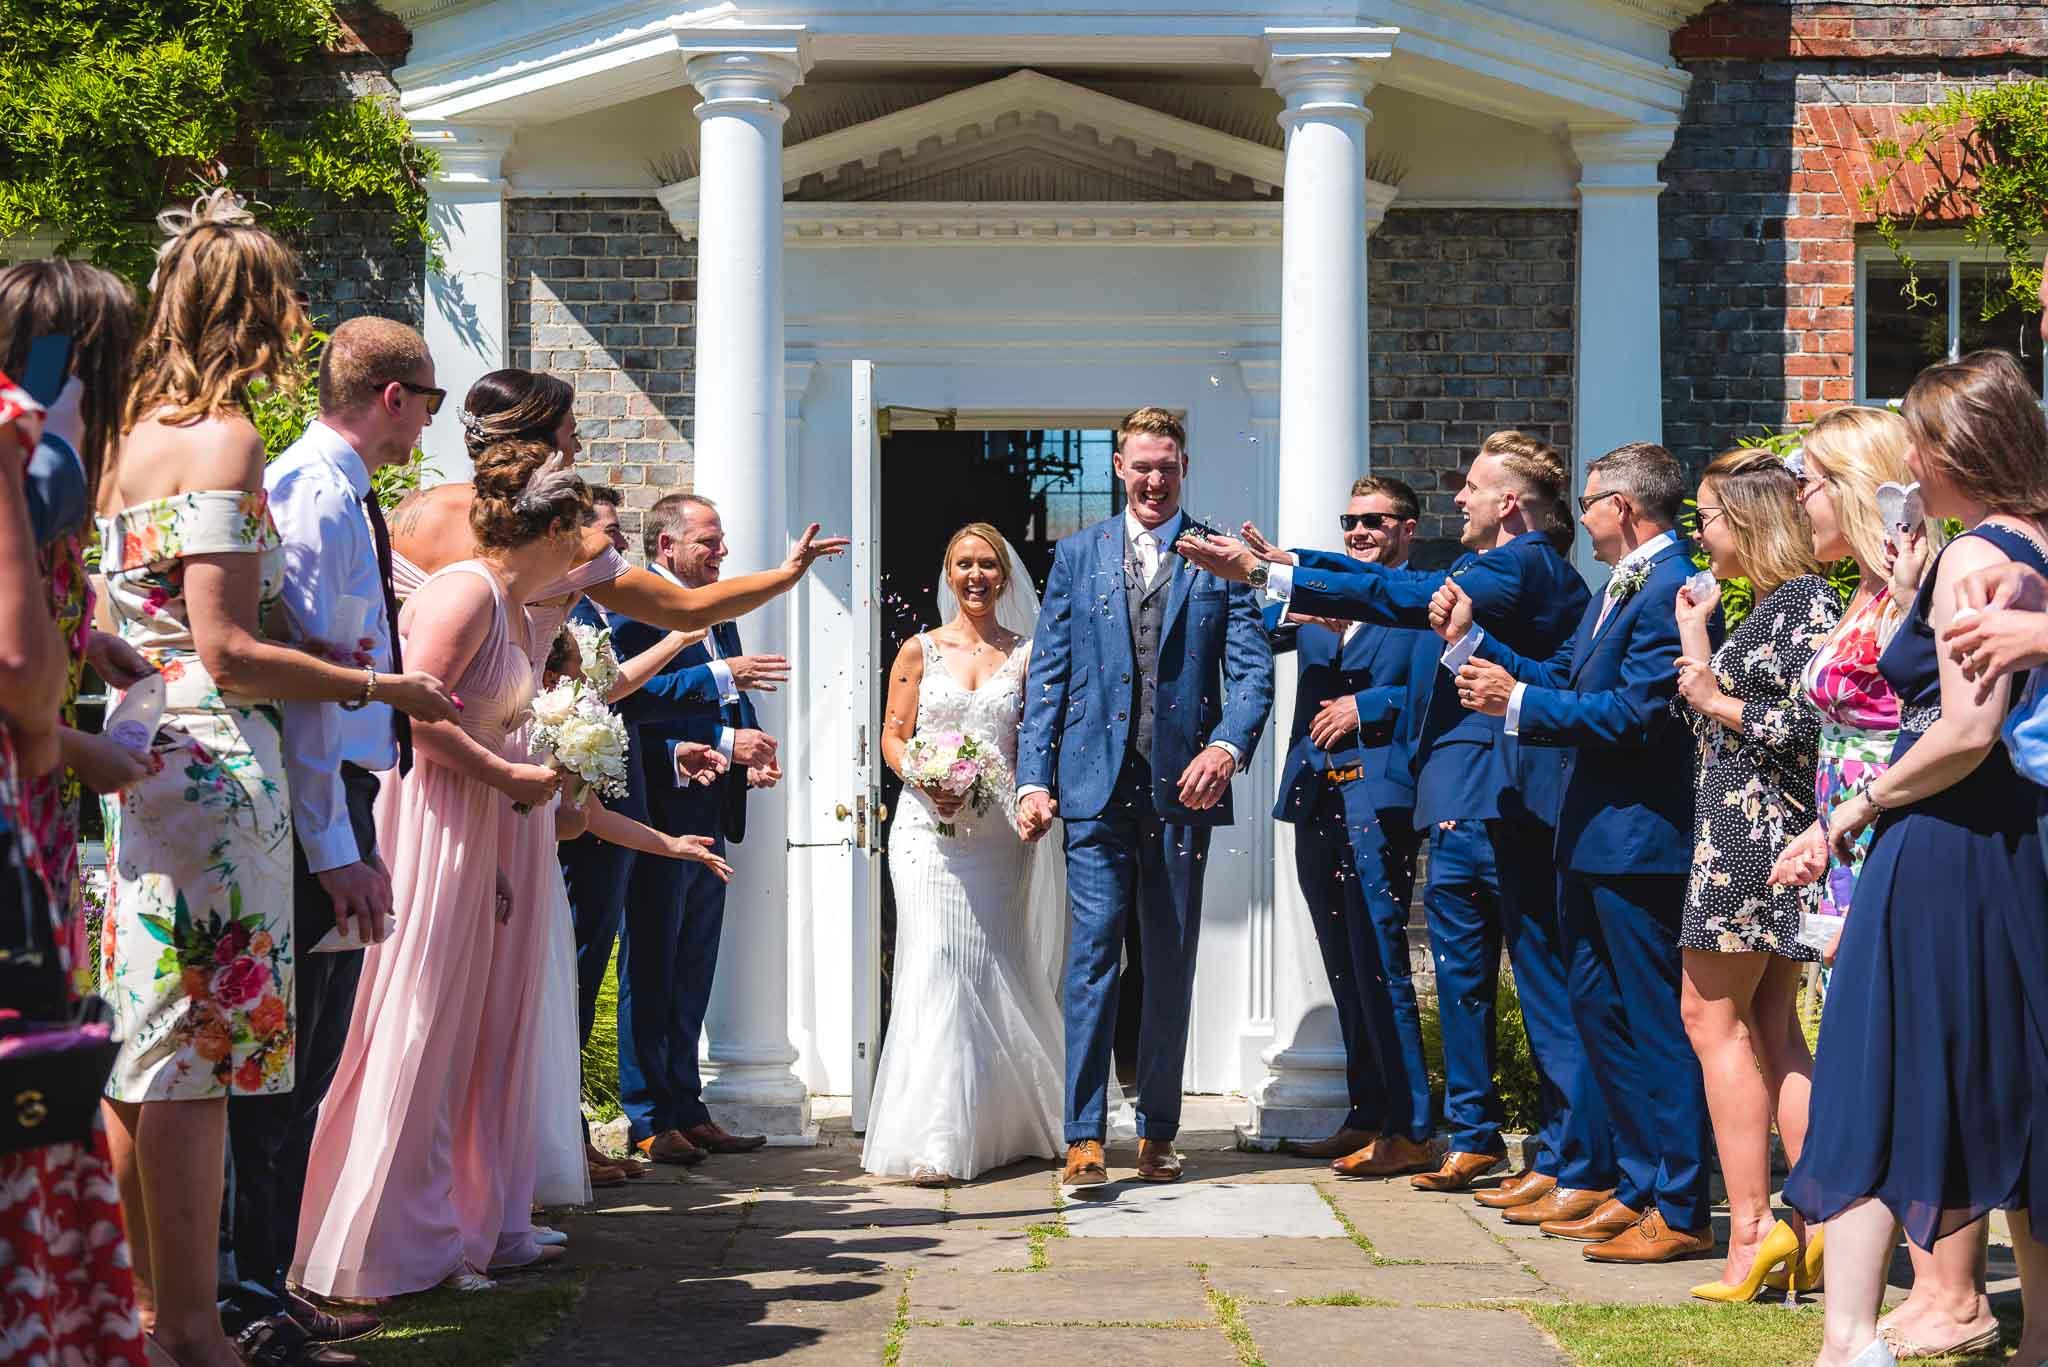 Helen & Tom, Gildredge Manor, Eastbourne – 17th June 2017